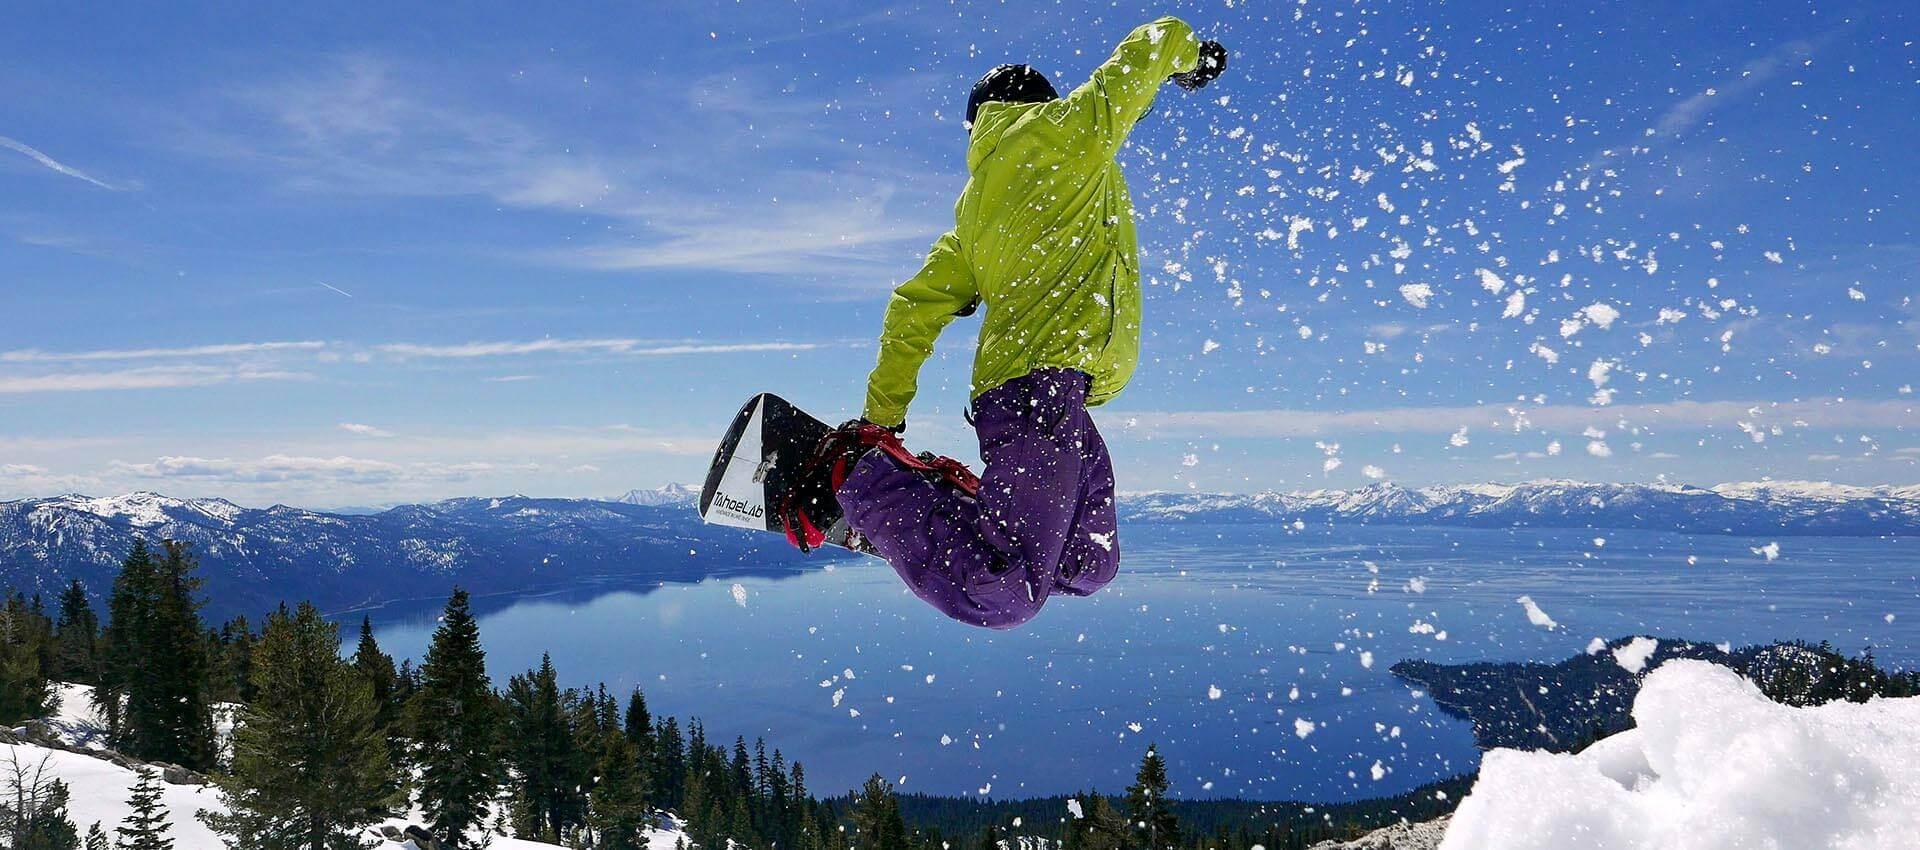 Winter Sports, Skiing in Nevada, Nevada Winter Sports, Ski, Snowboard, Winter Activities